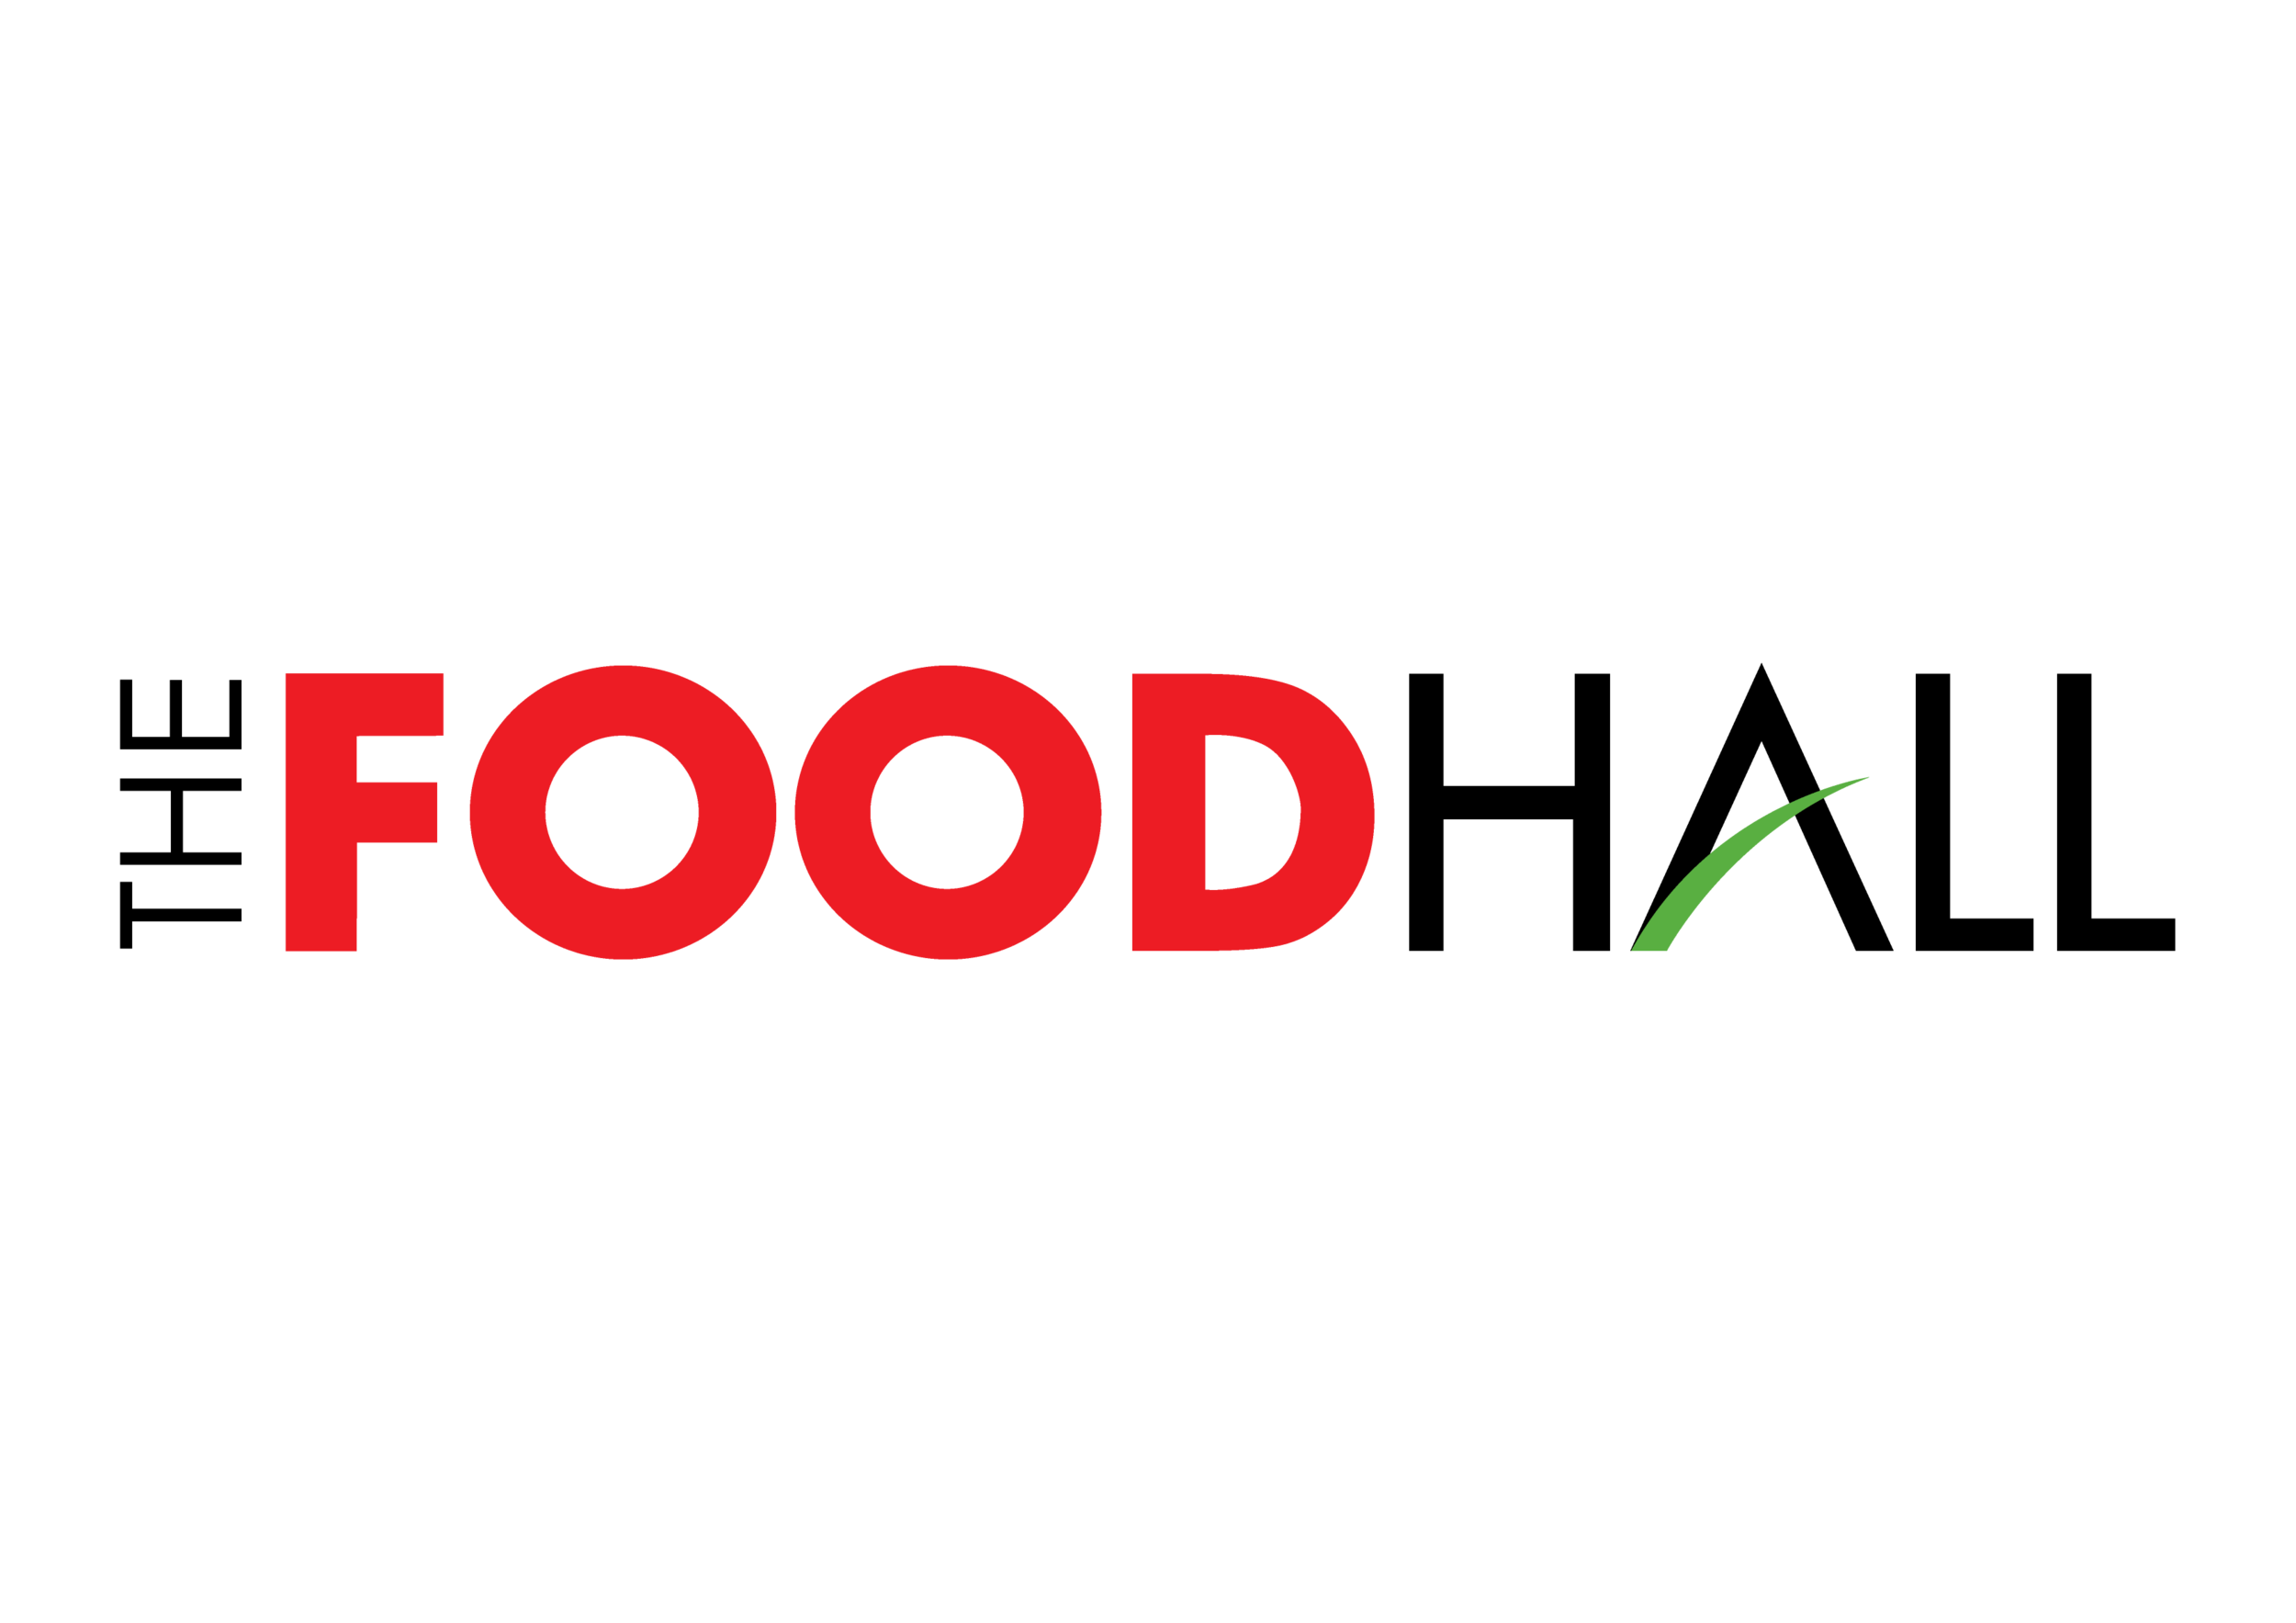 FoodHallLogo.png